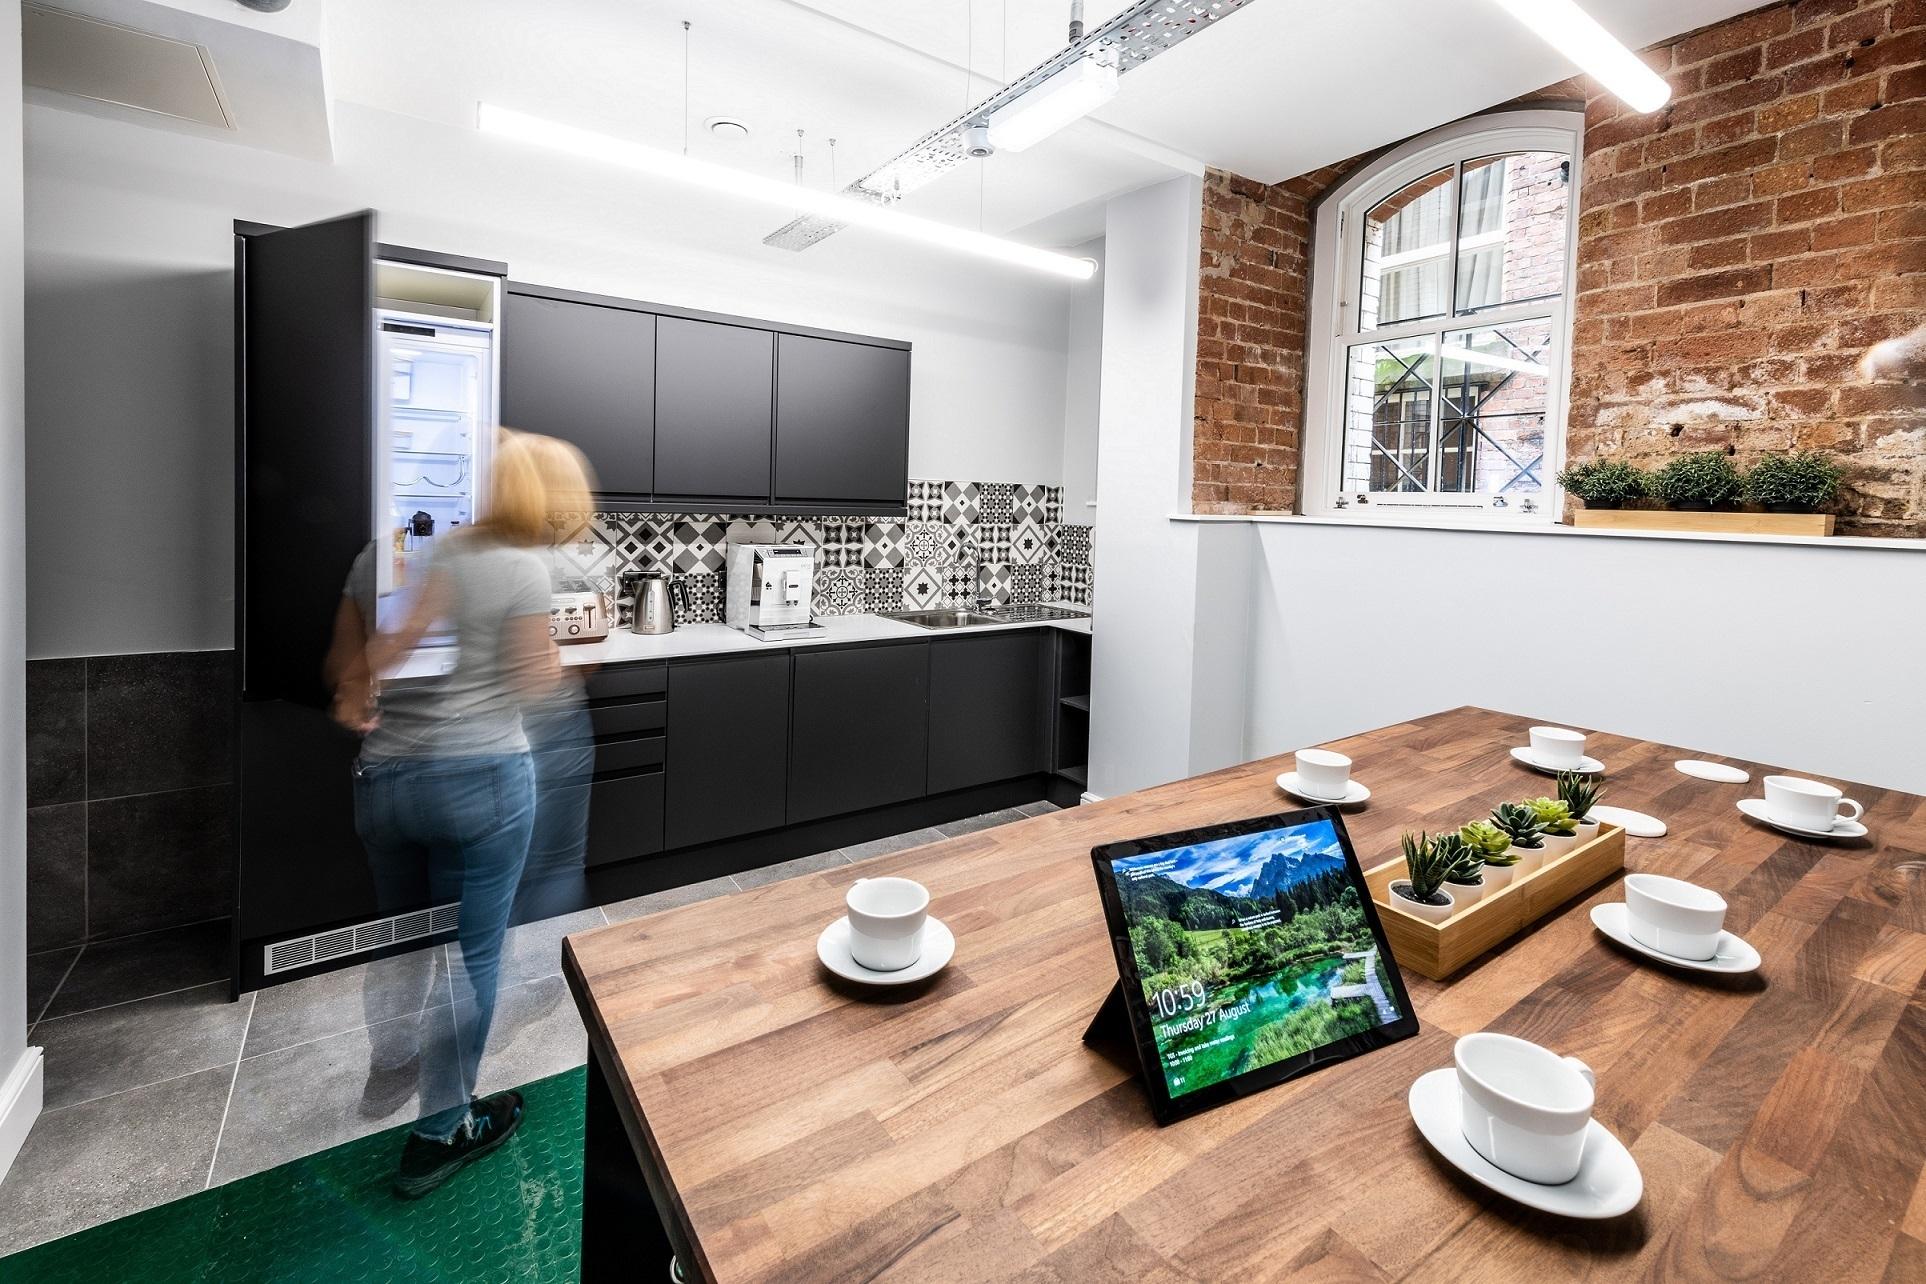 Stoney Street Studios Communal kitchen